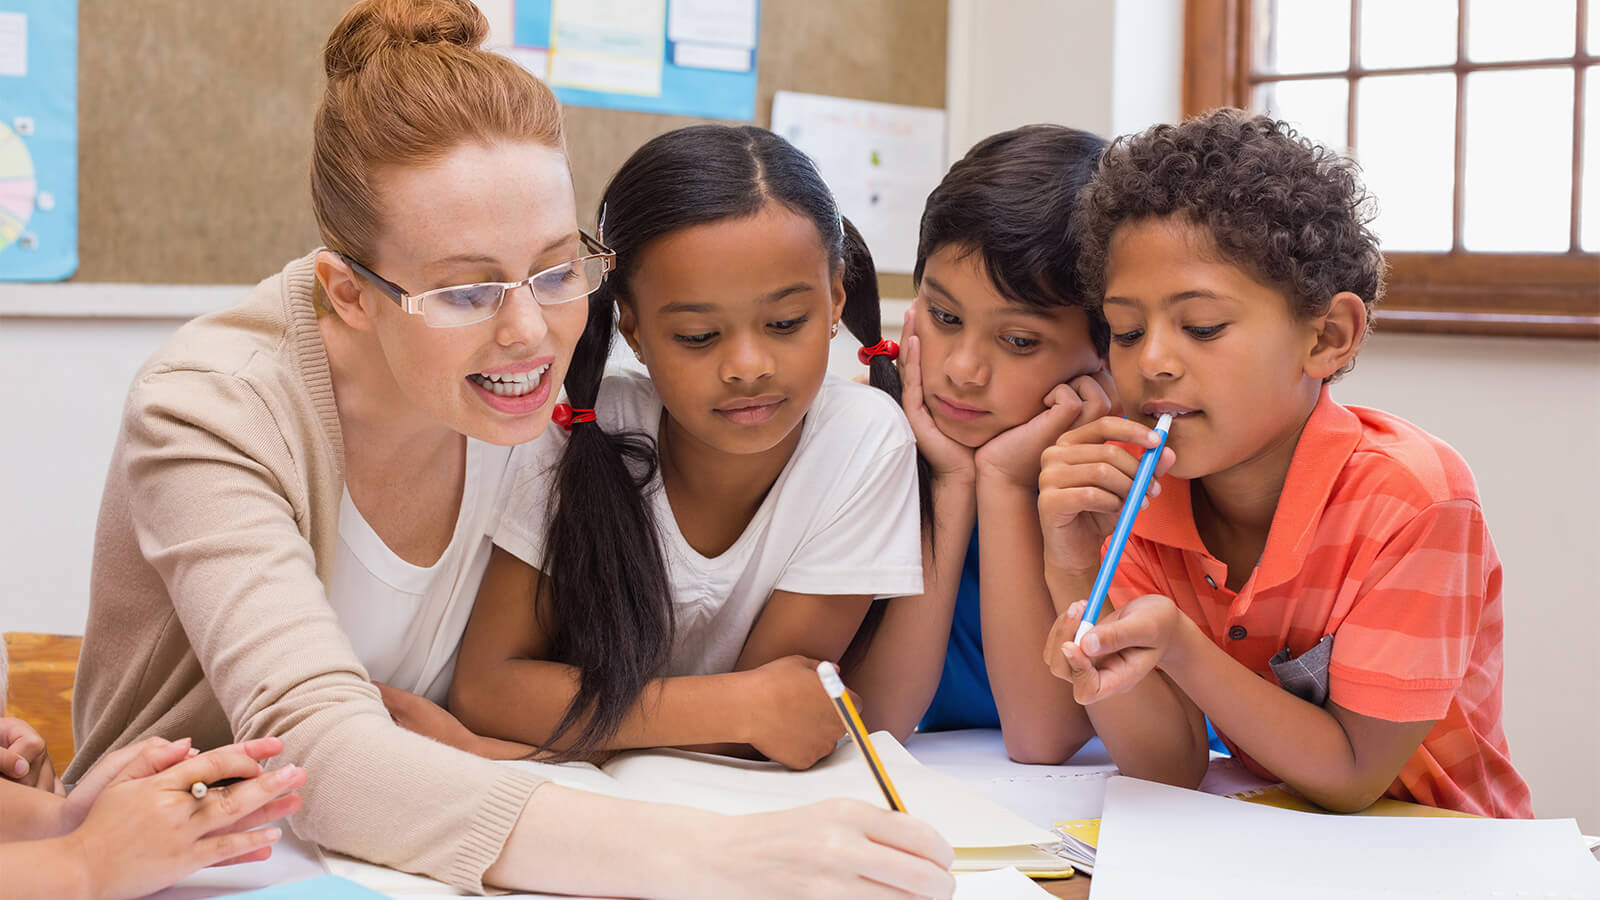 Essay Writing On Teacher My Role Model